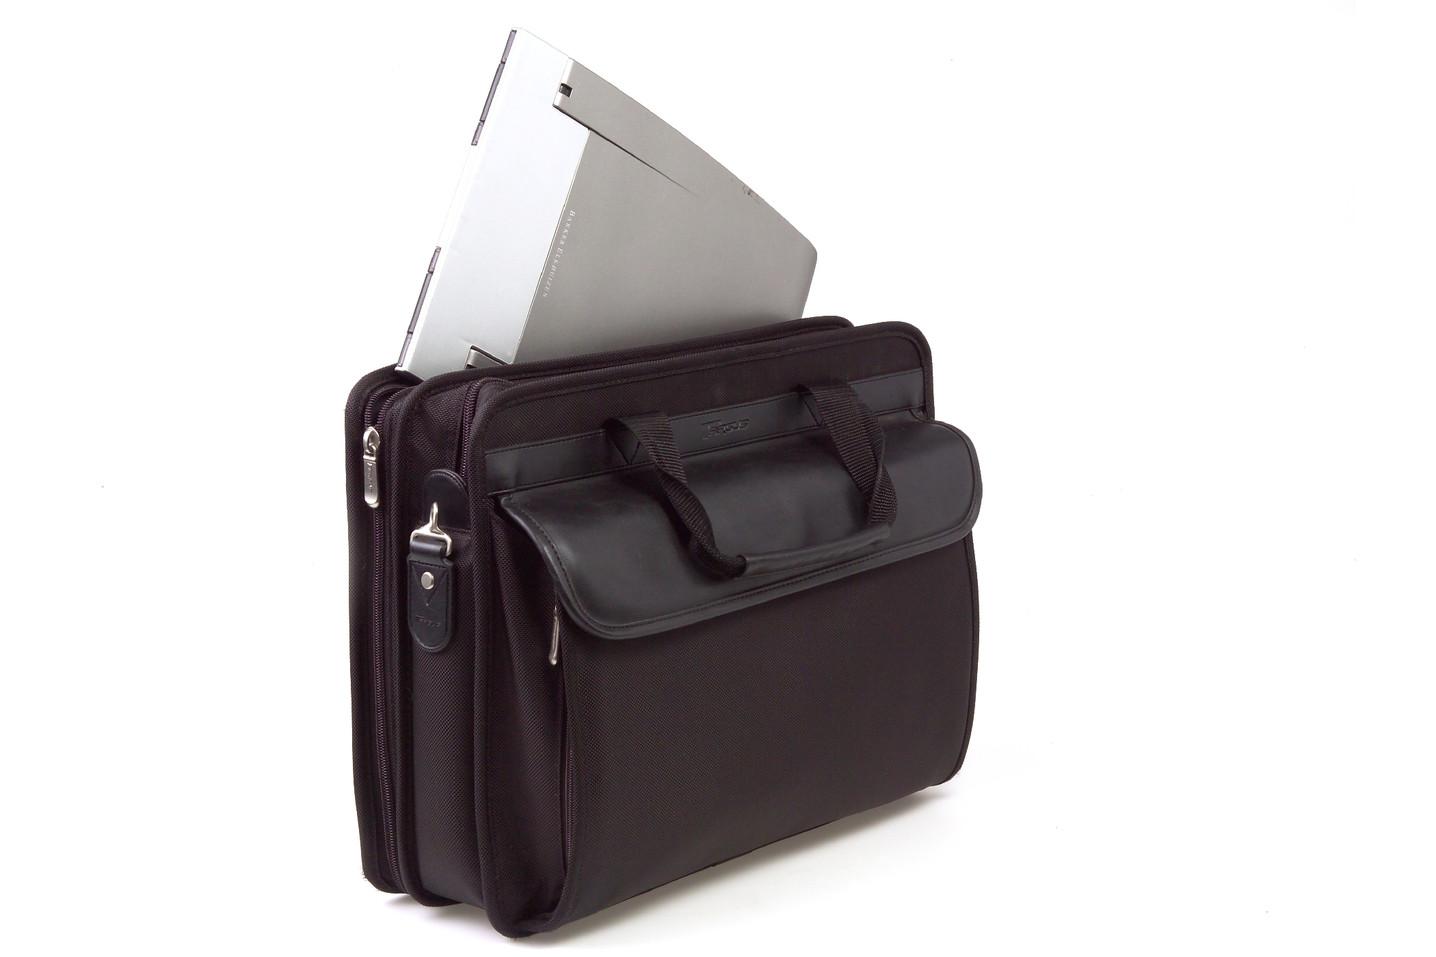 ergo-q-330-notebook-stand-1395147977.jpg